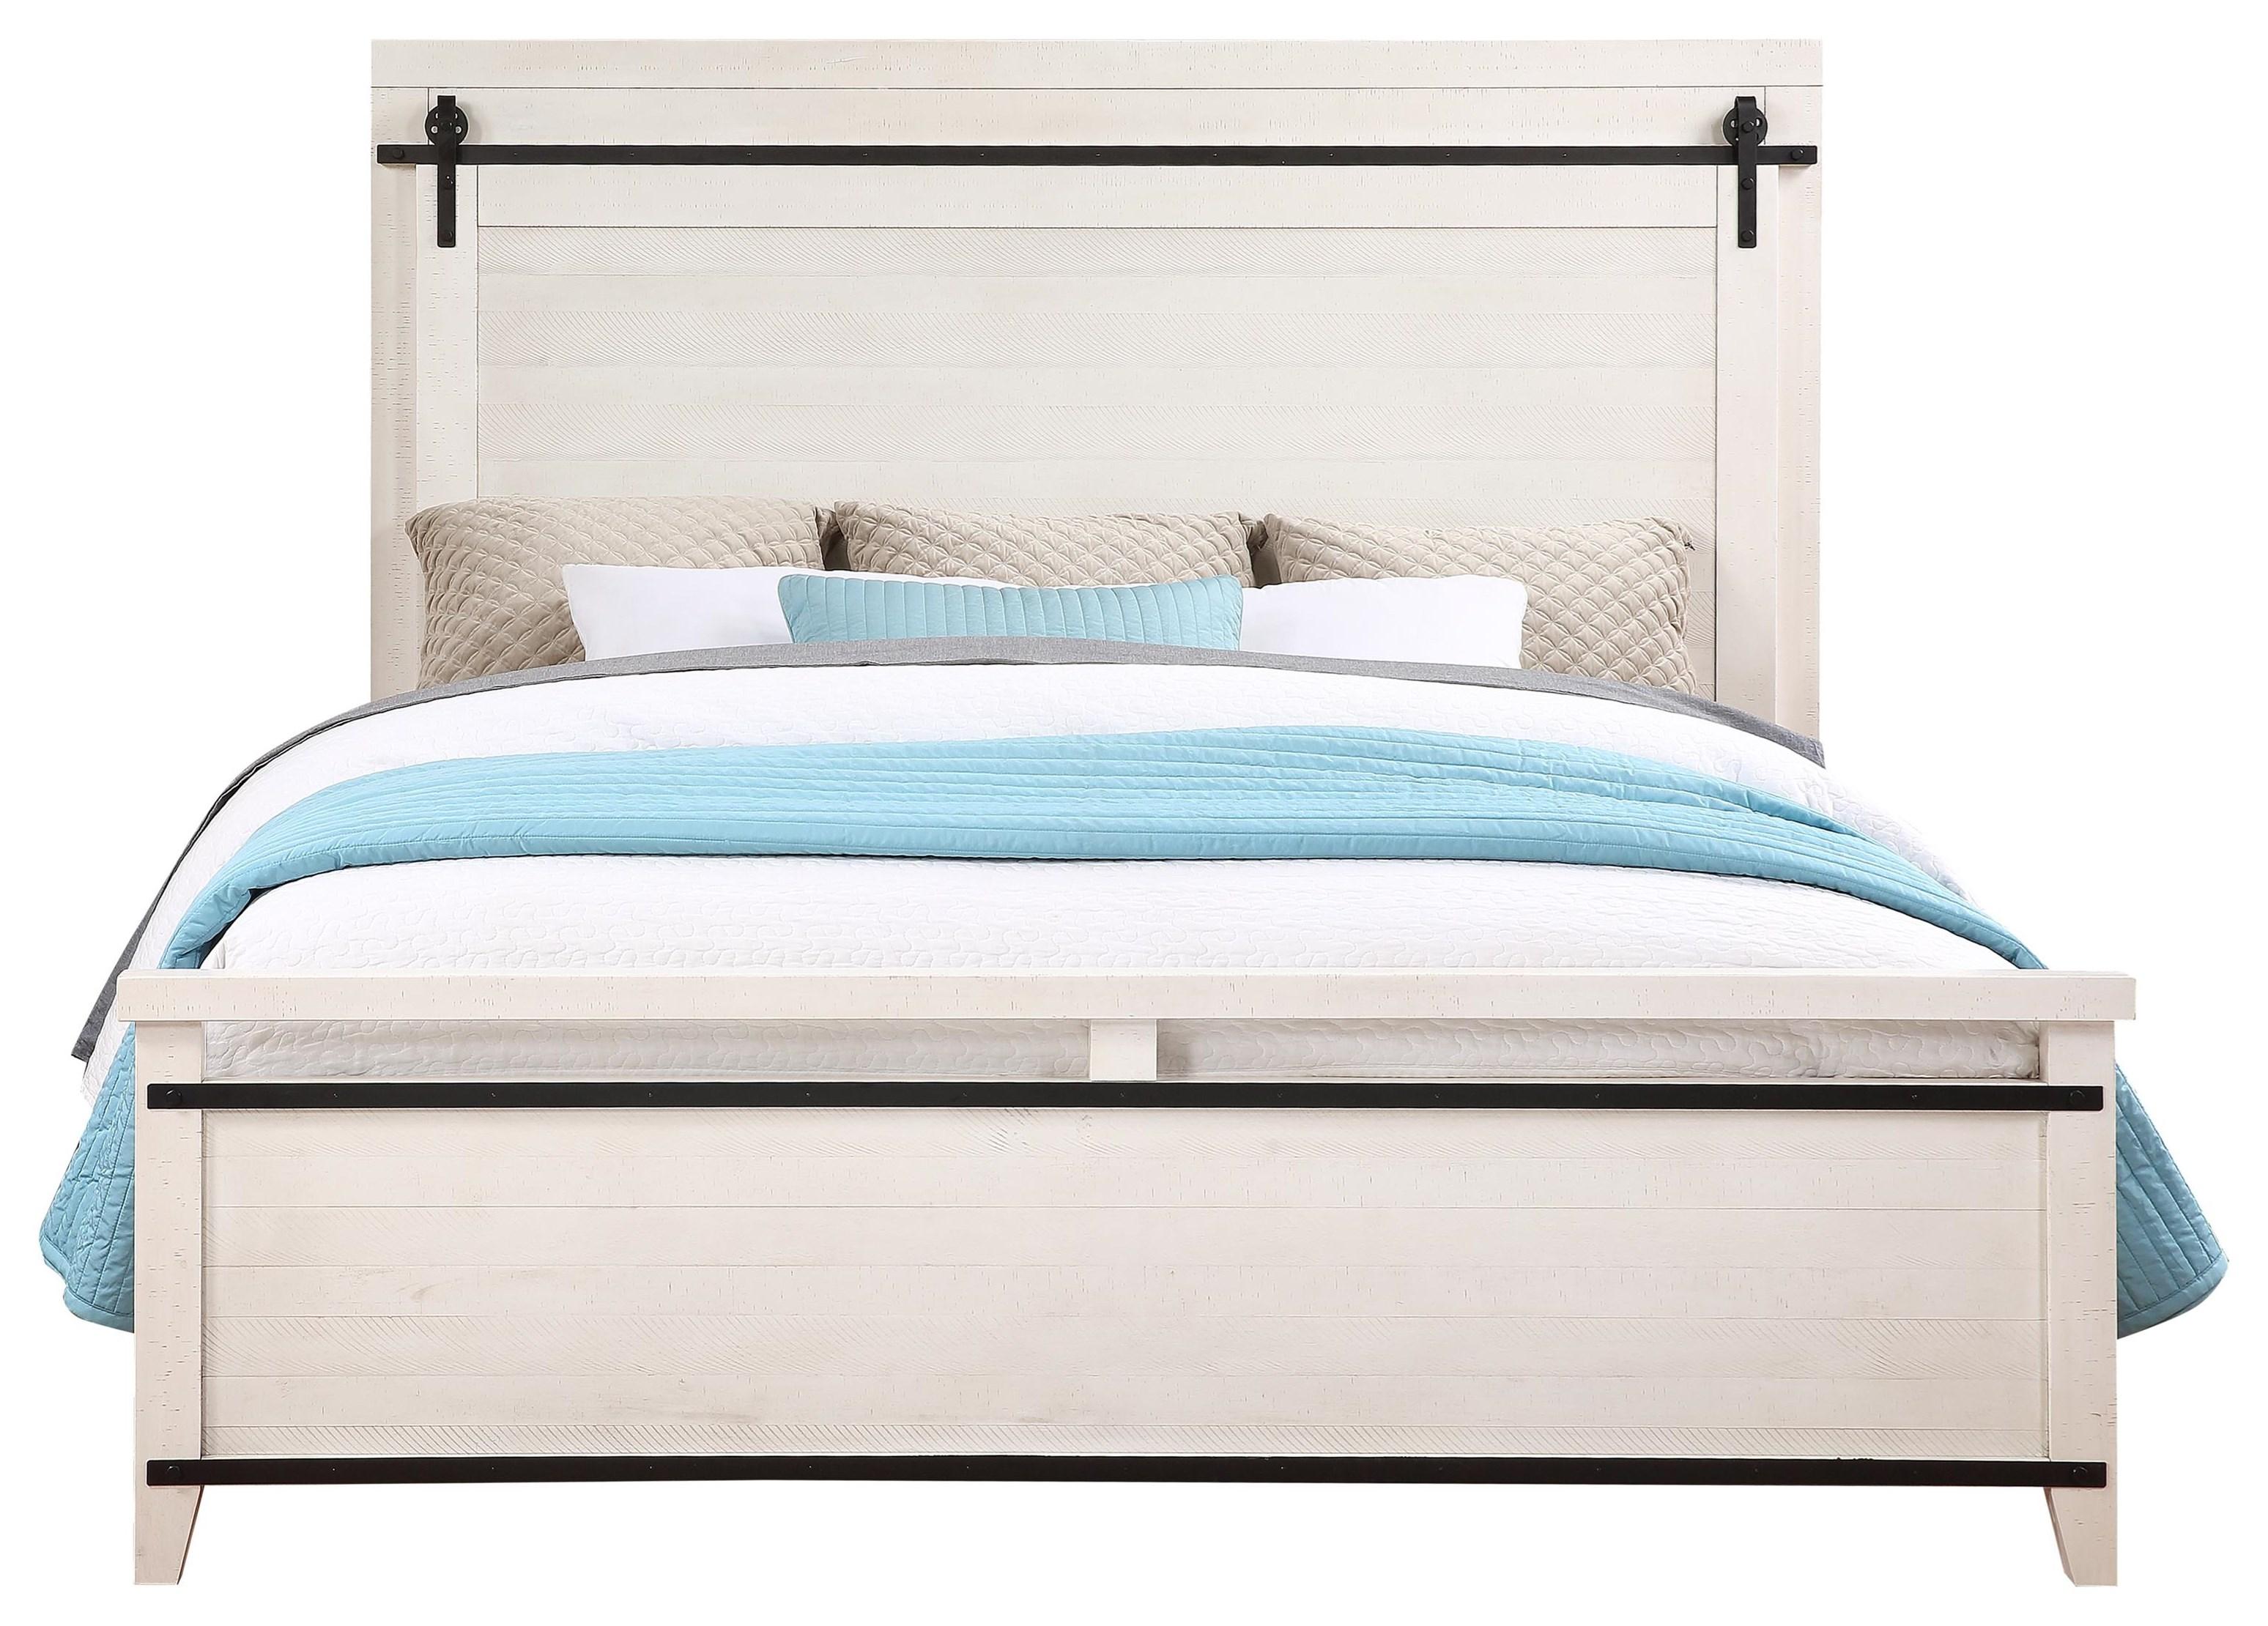 Dakota King Size Panel Bed by HH at Walker's Furniture